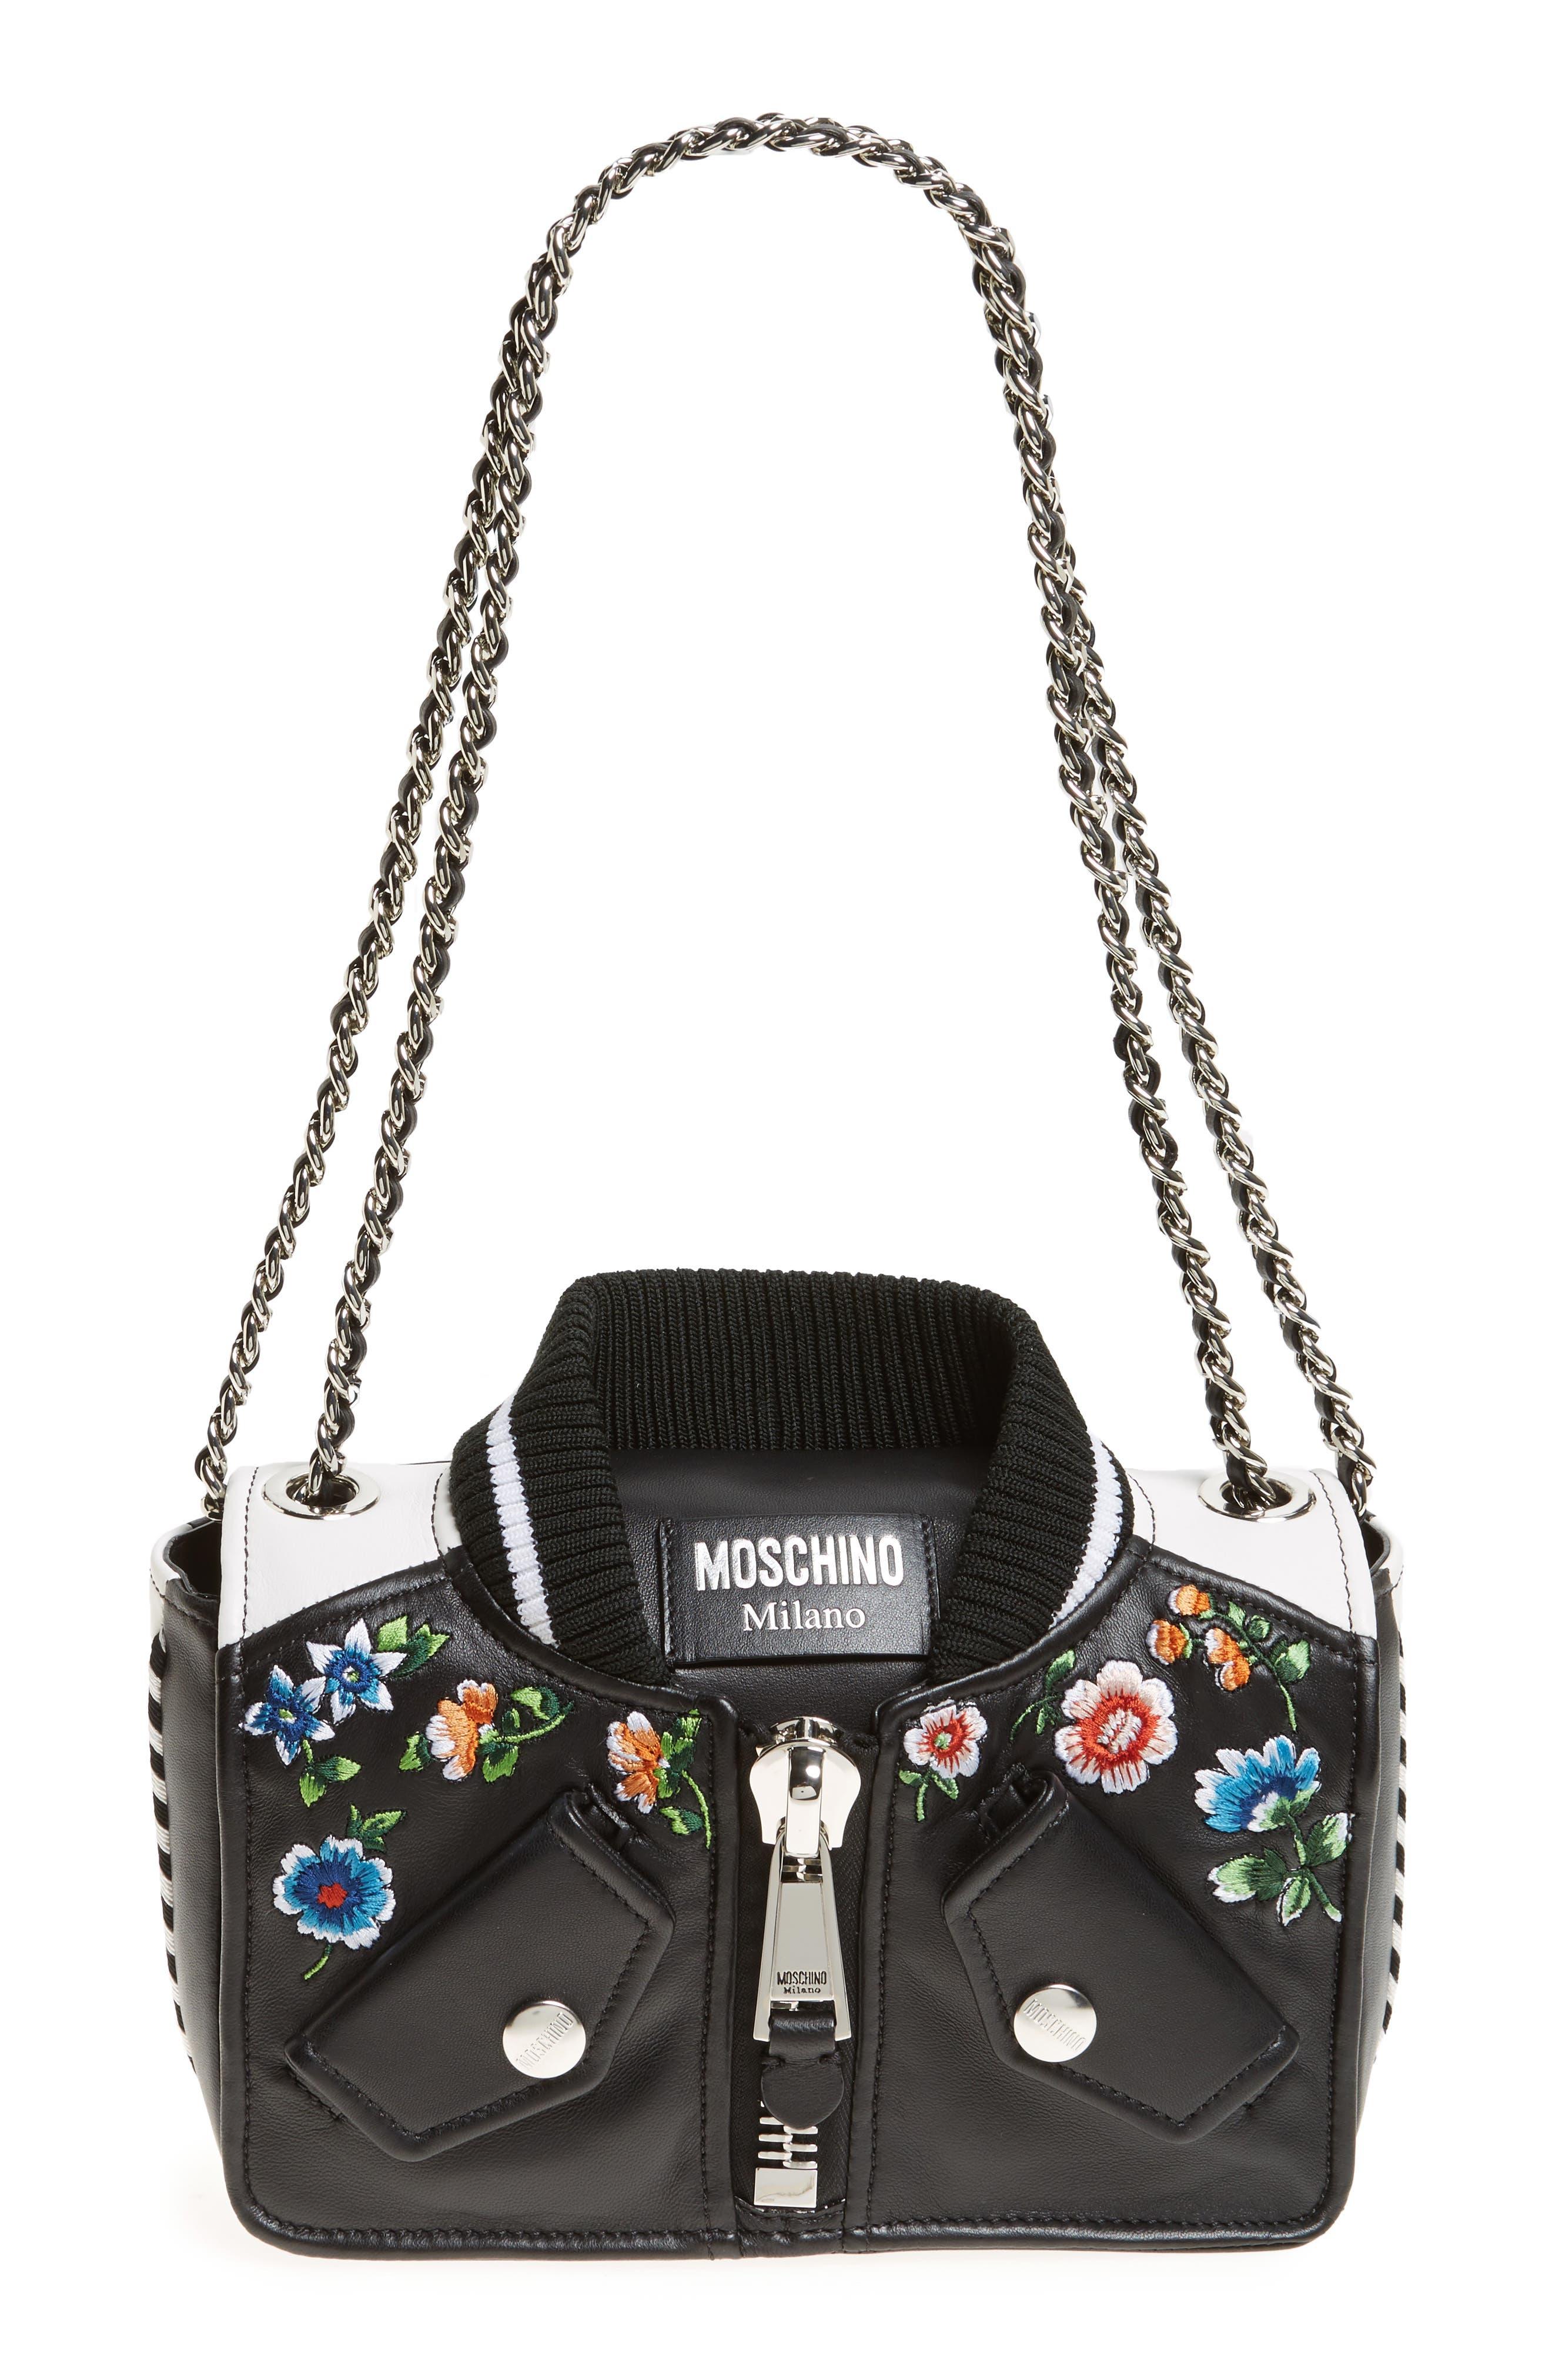 Main Image - Moschino Embroidered Floral Bomber Jacket Leather Shoulder Bag